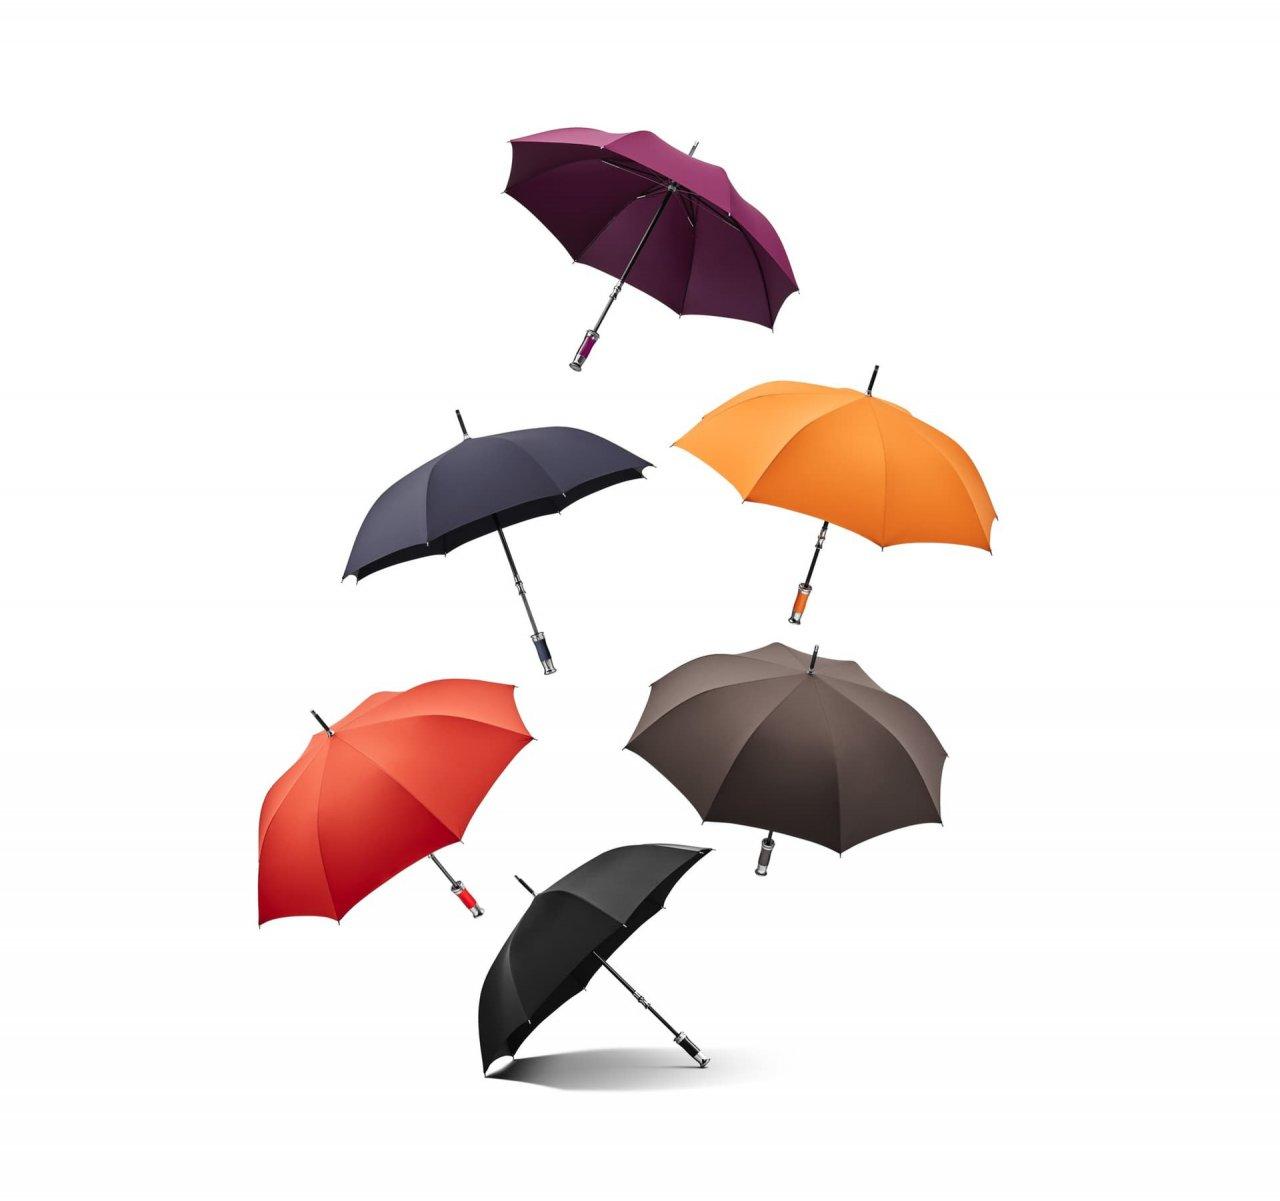 Rolls-Royce umbrellas